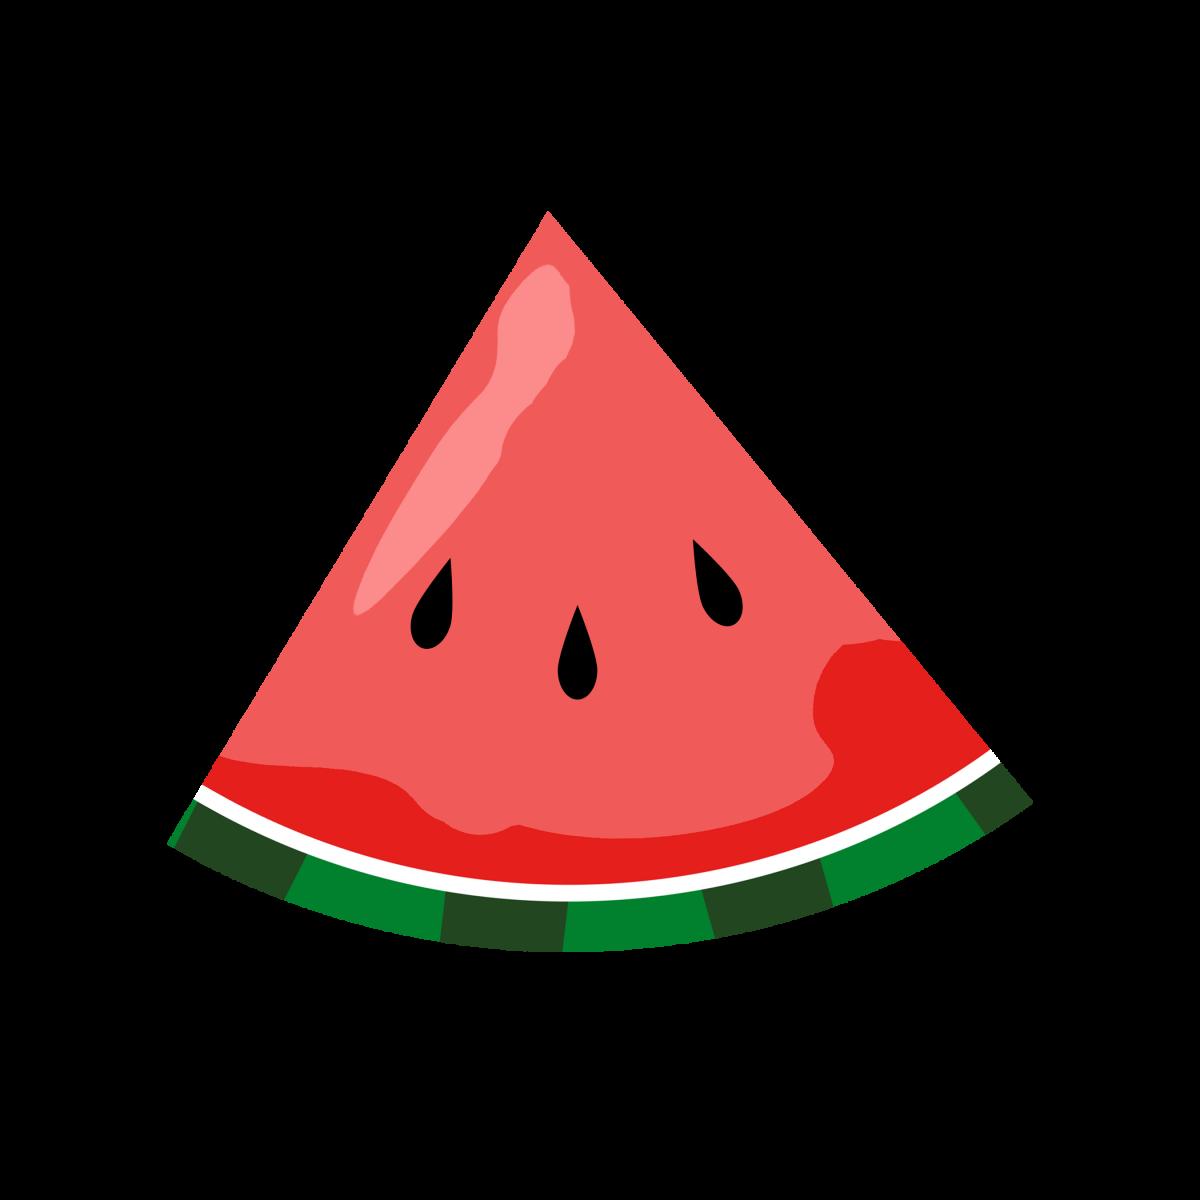 Watermelon clipart 5